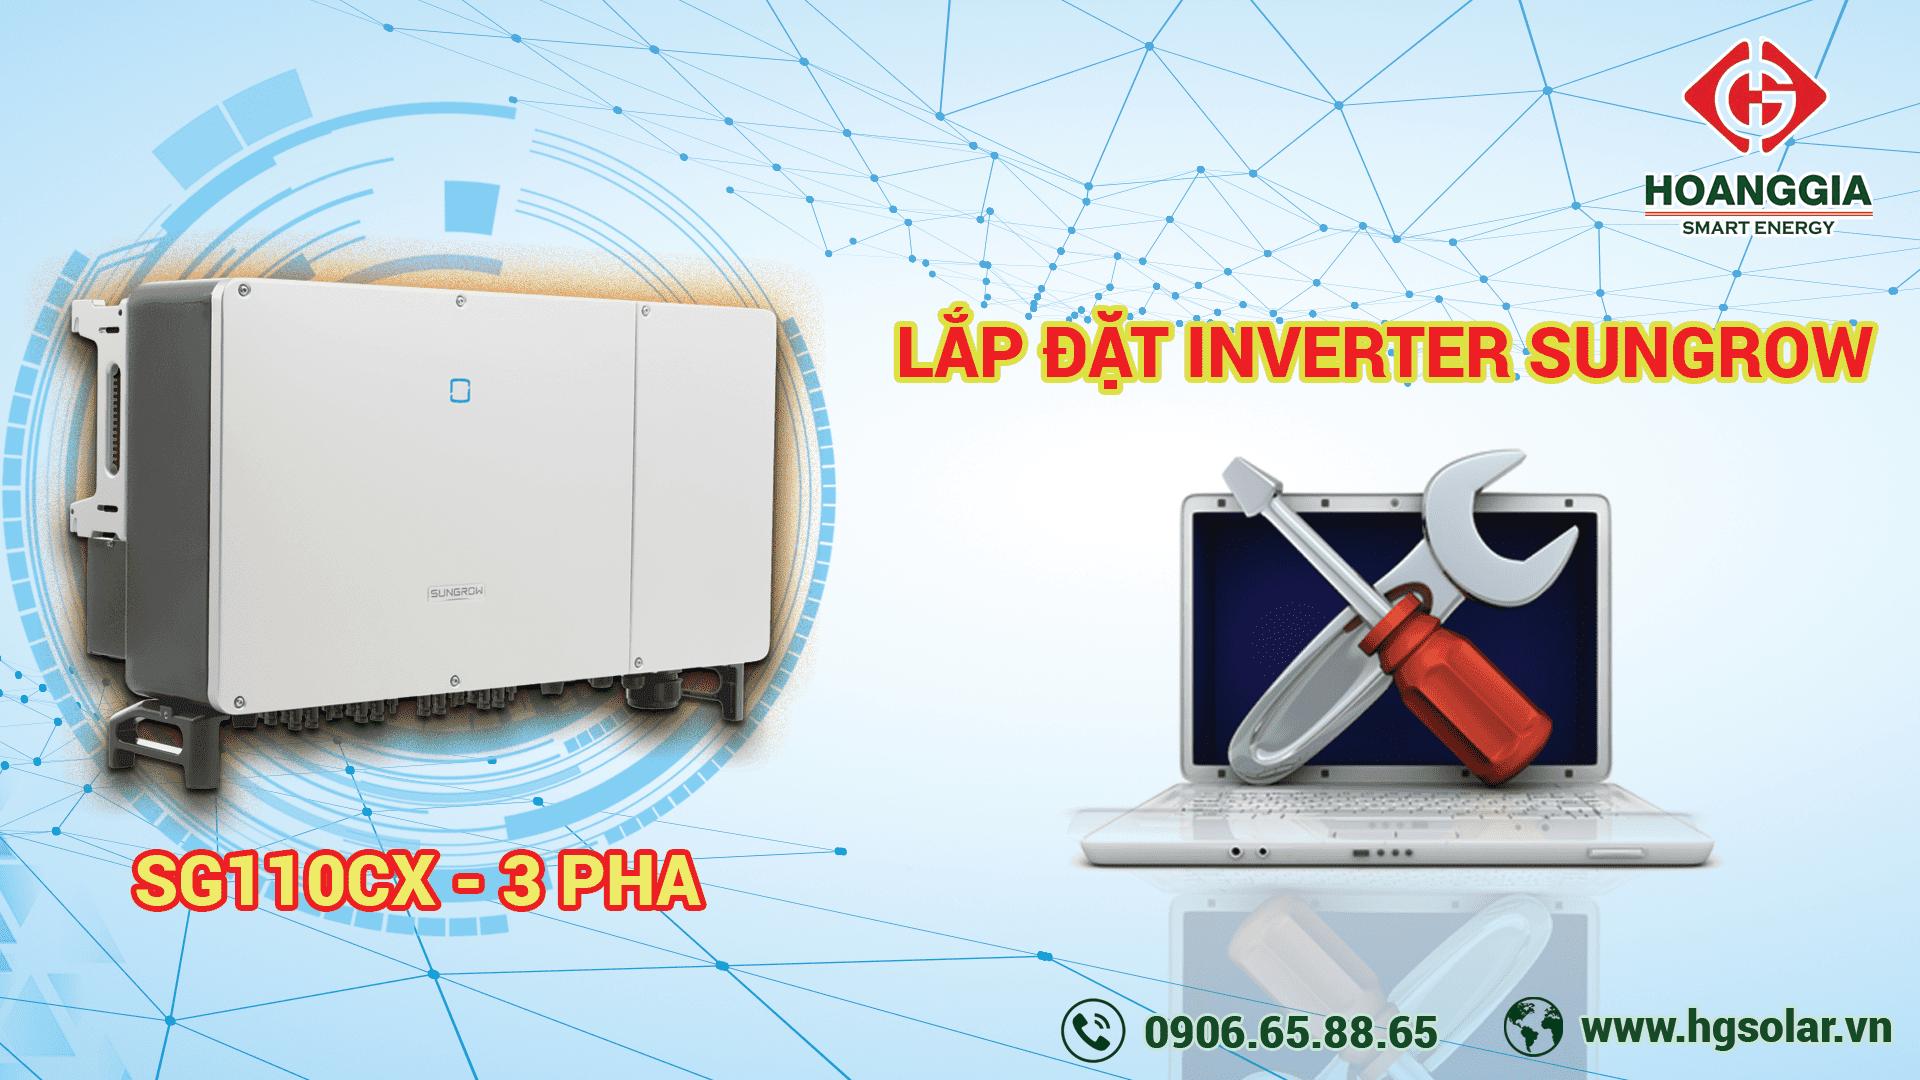 Hướng dẫn lắp đặt inverter Sungrow 110kW -3 PHASE (SG110CX)